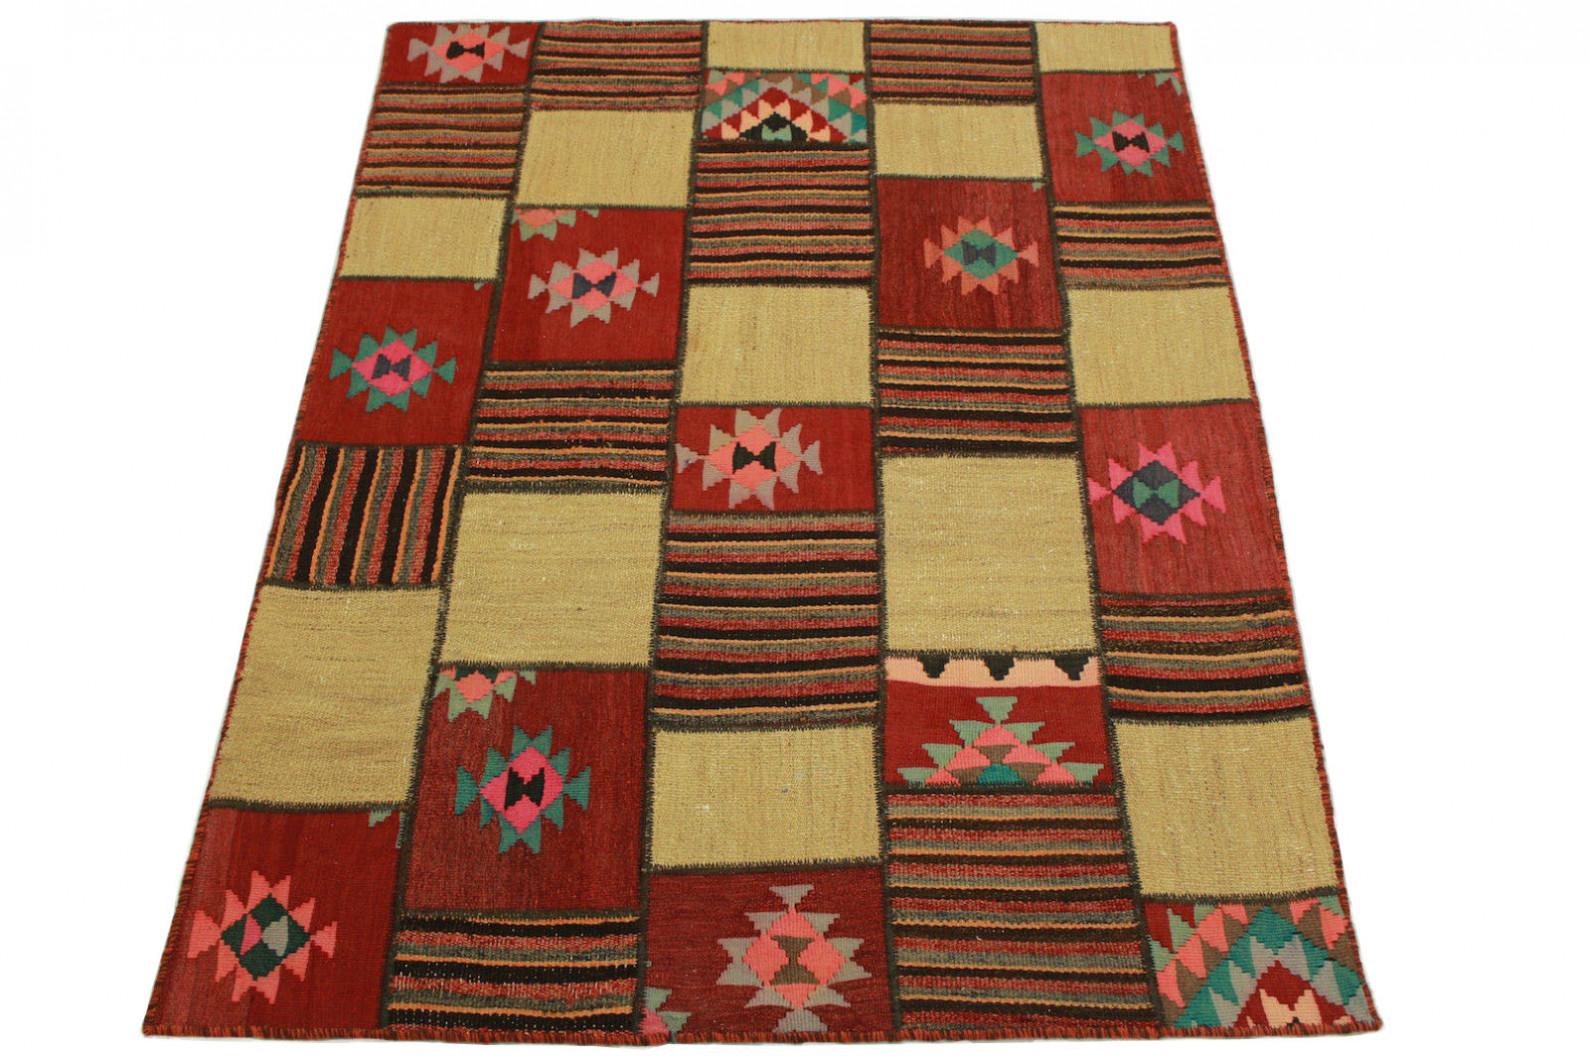 kelim patchwork teppich rot beige rosa in 200x150cm 1001 2491 bei kaufen. Black Bedroom Furniture Sets. Home Design Ideas